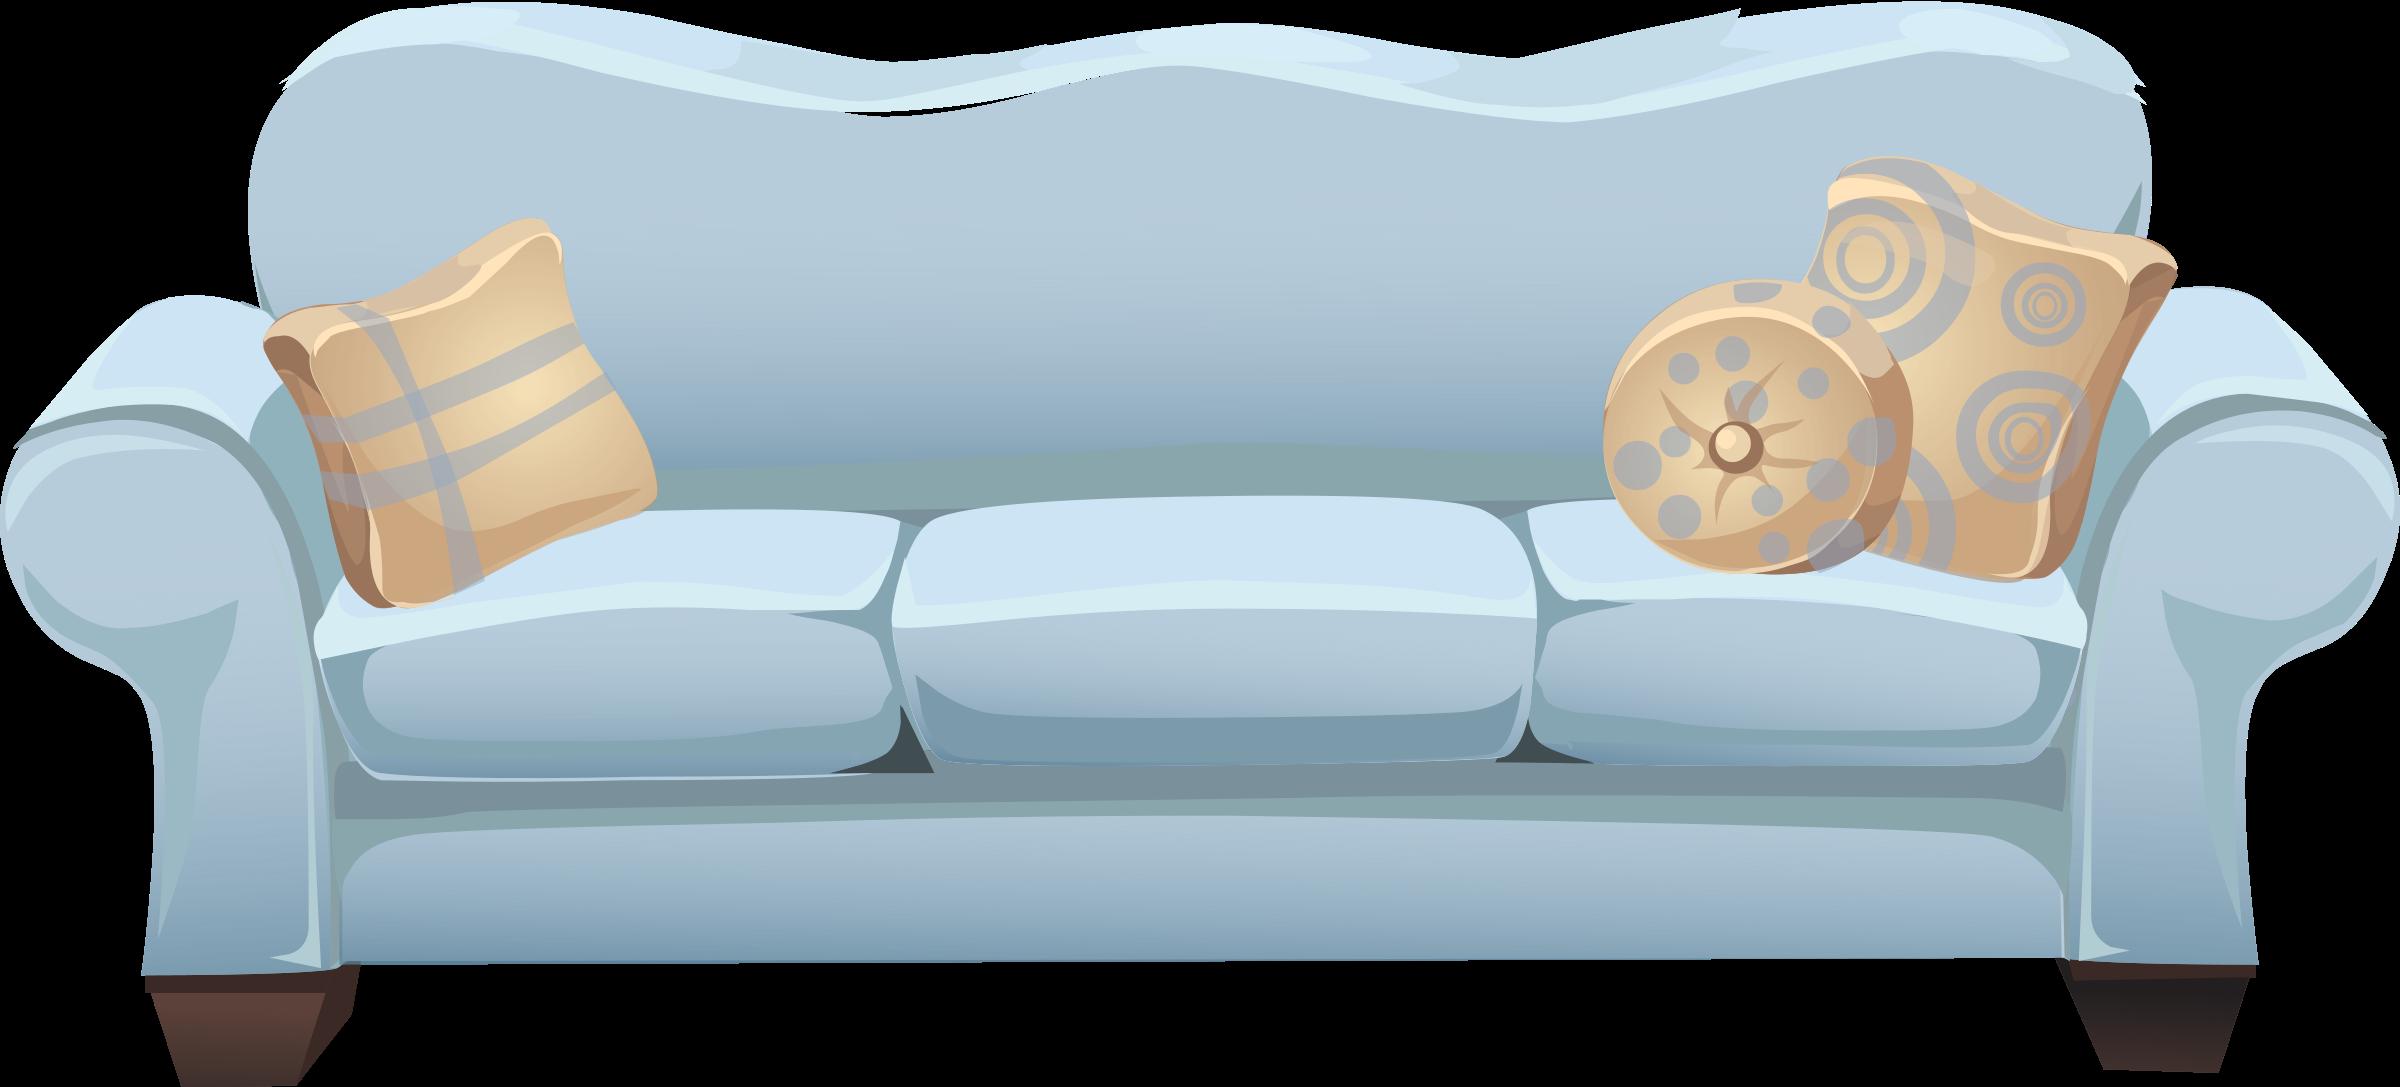 Furniture sala set